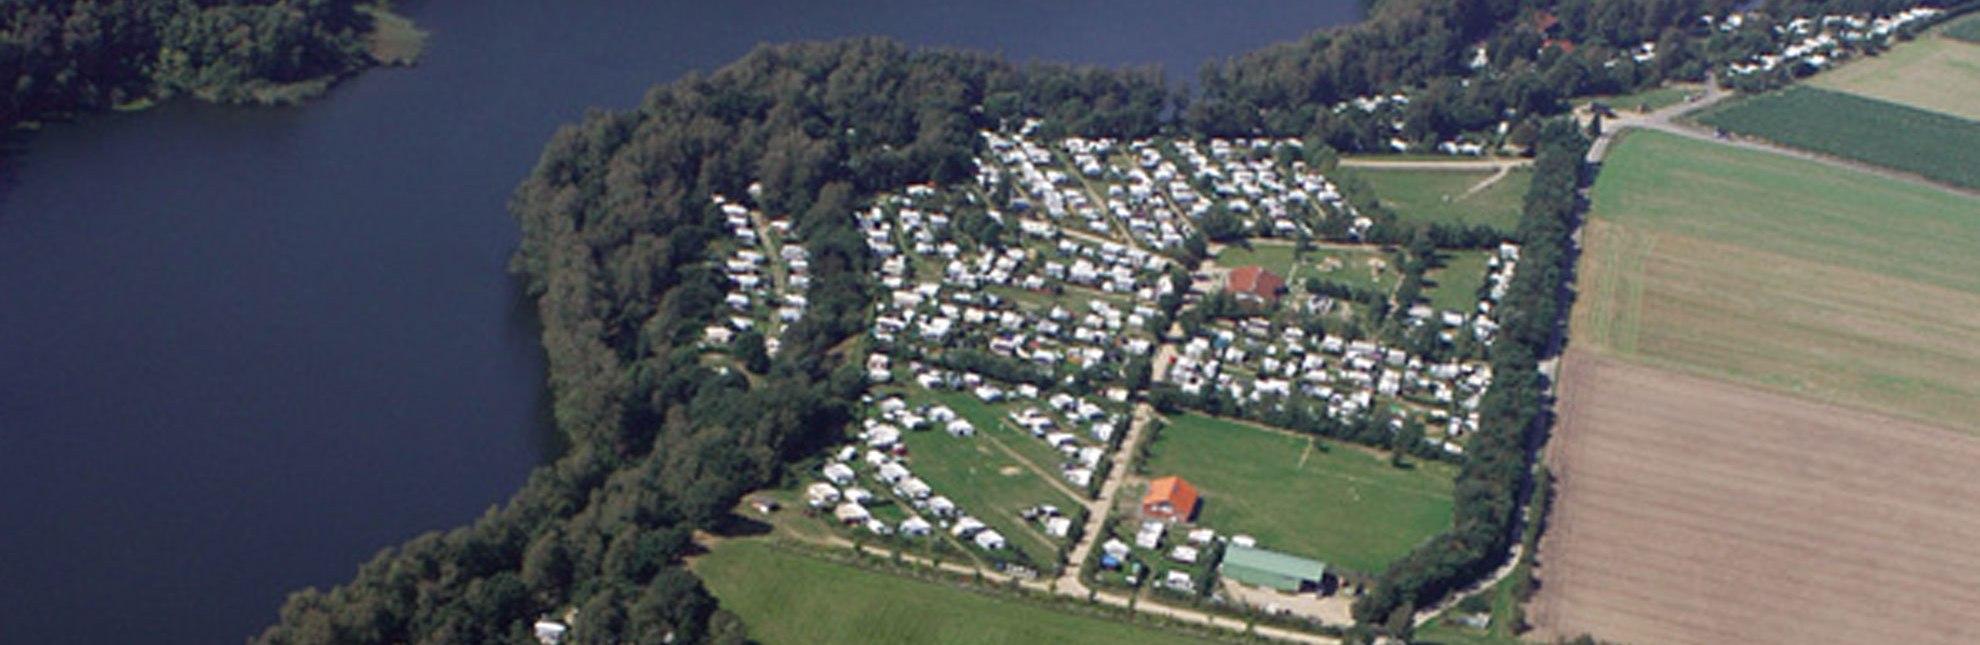 Salemer See Camping